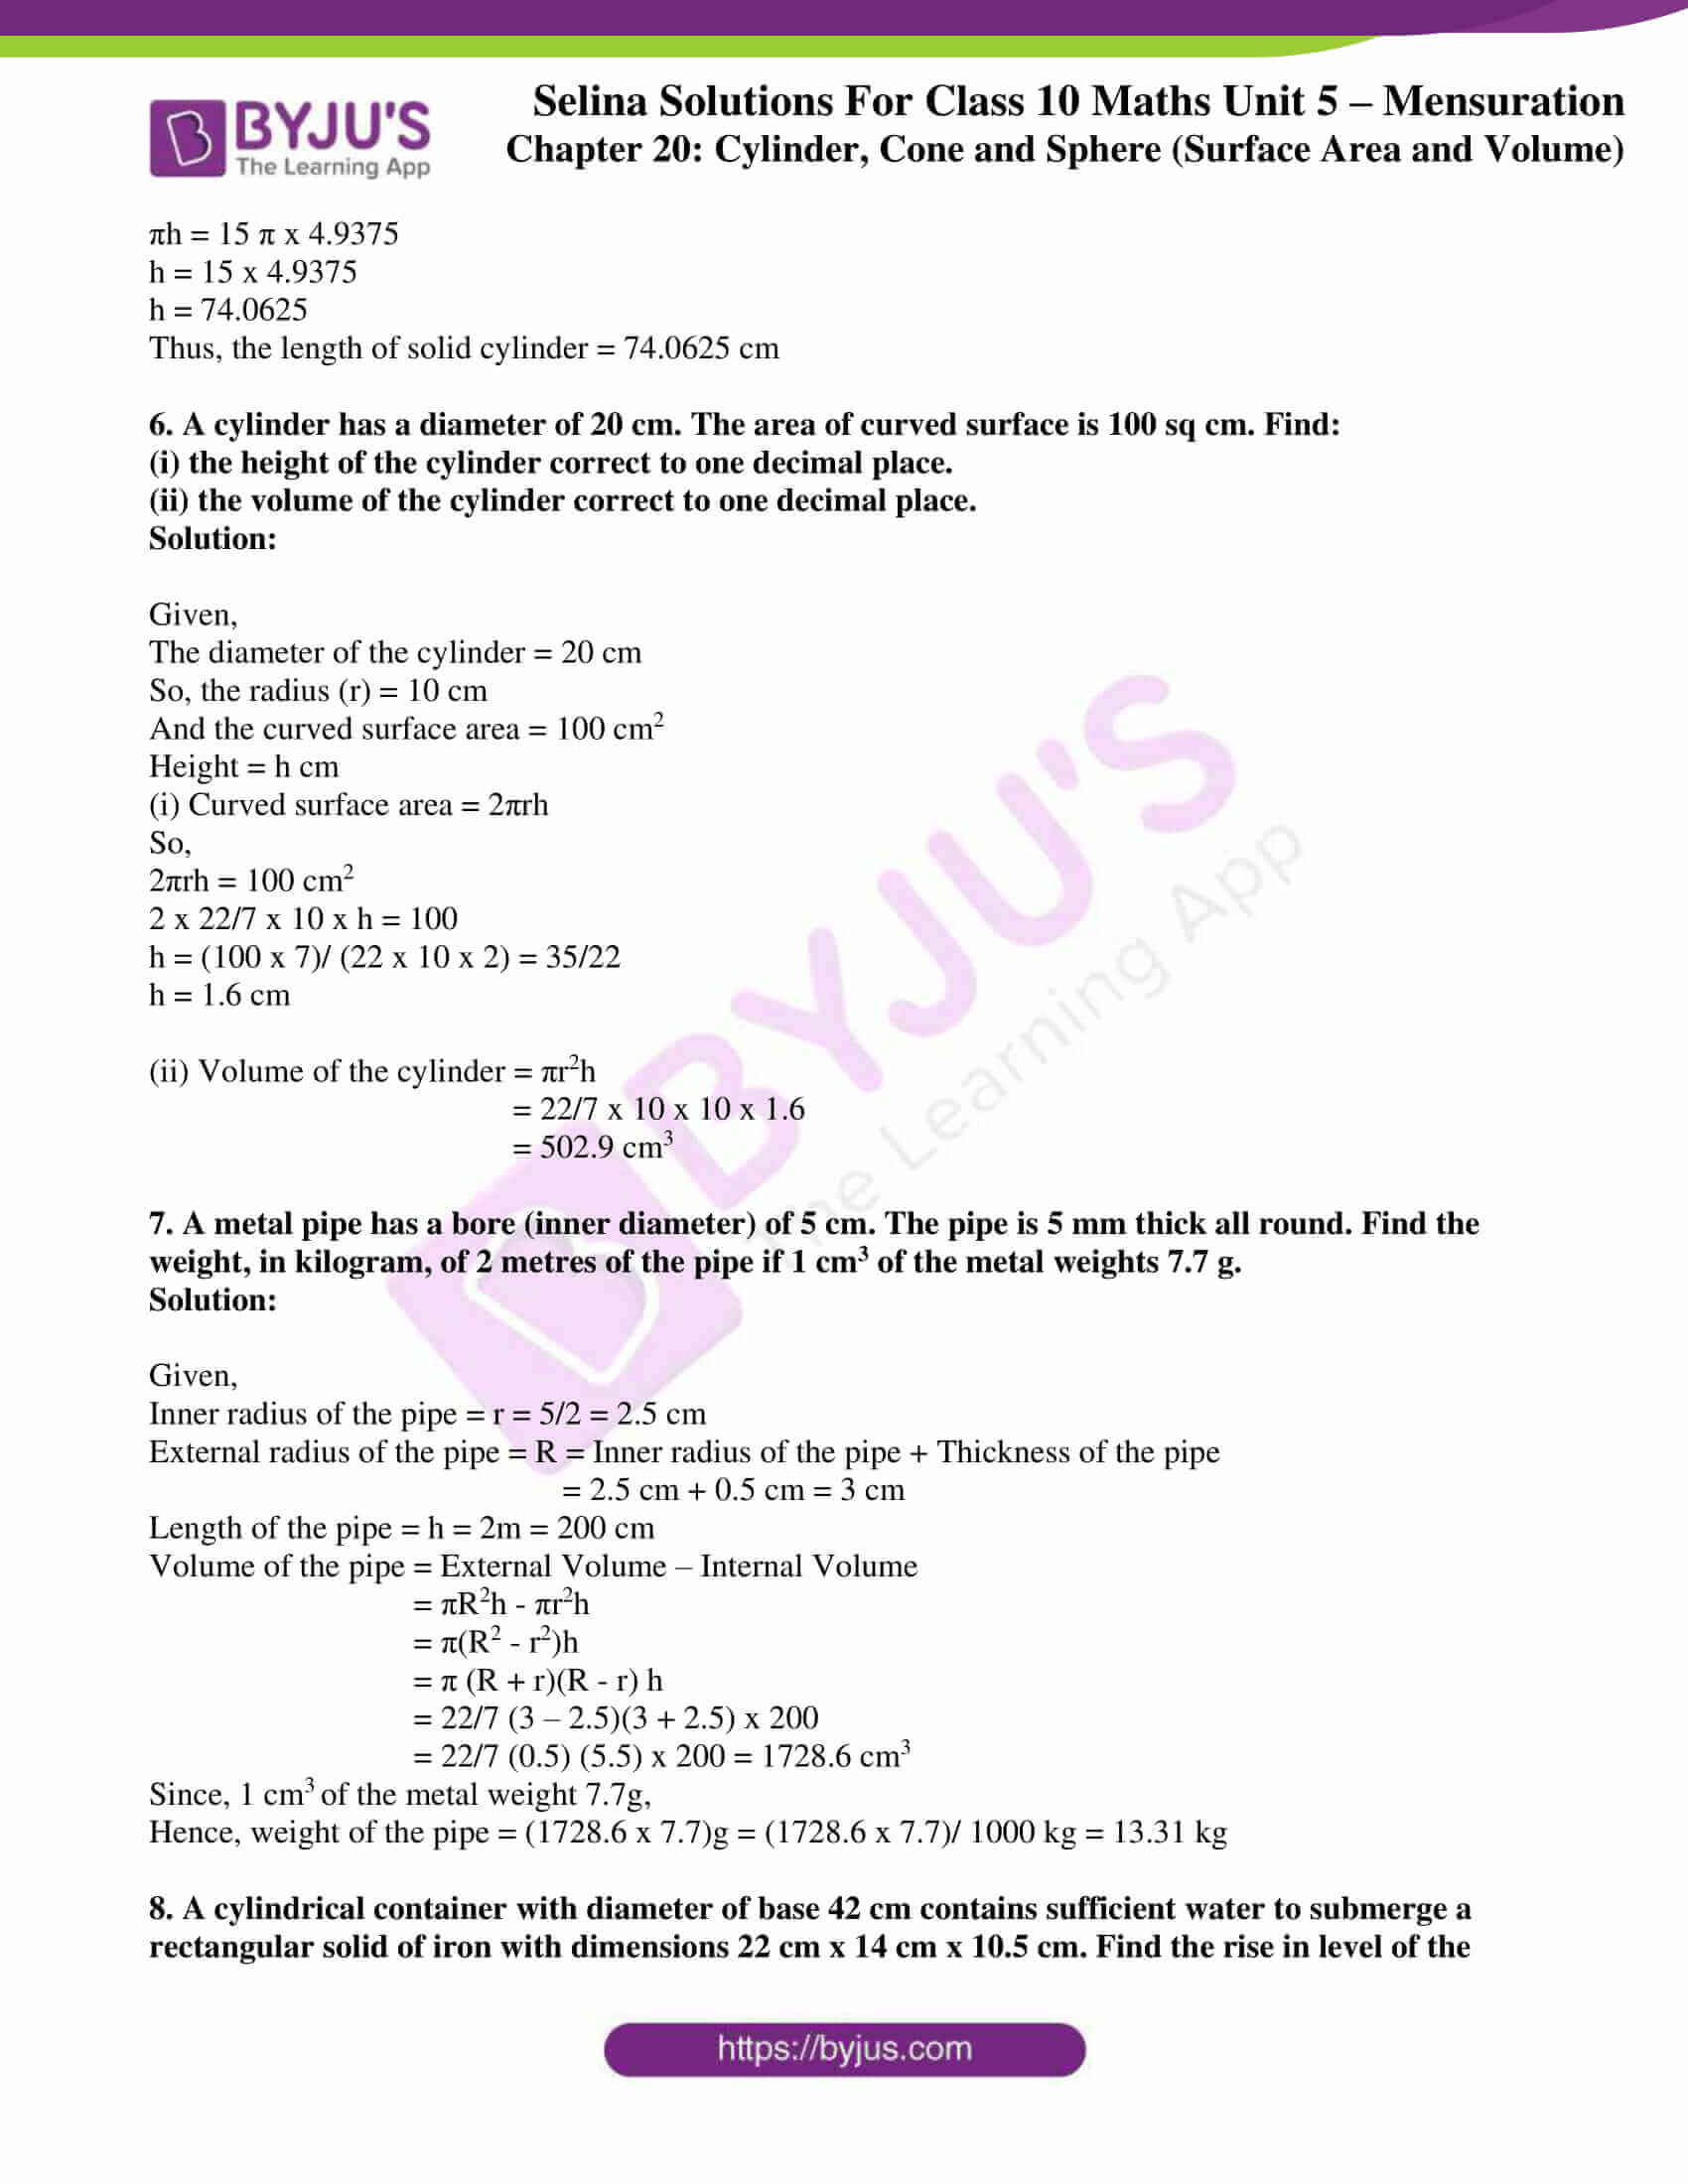 selina-sol-maths-class-10-ch-20-ex-a-3